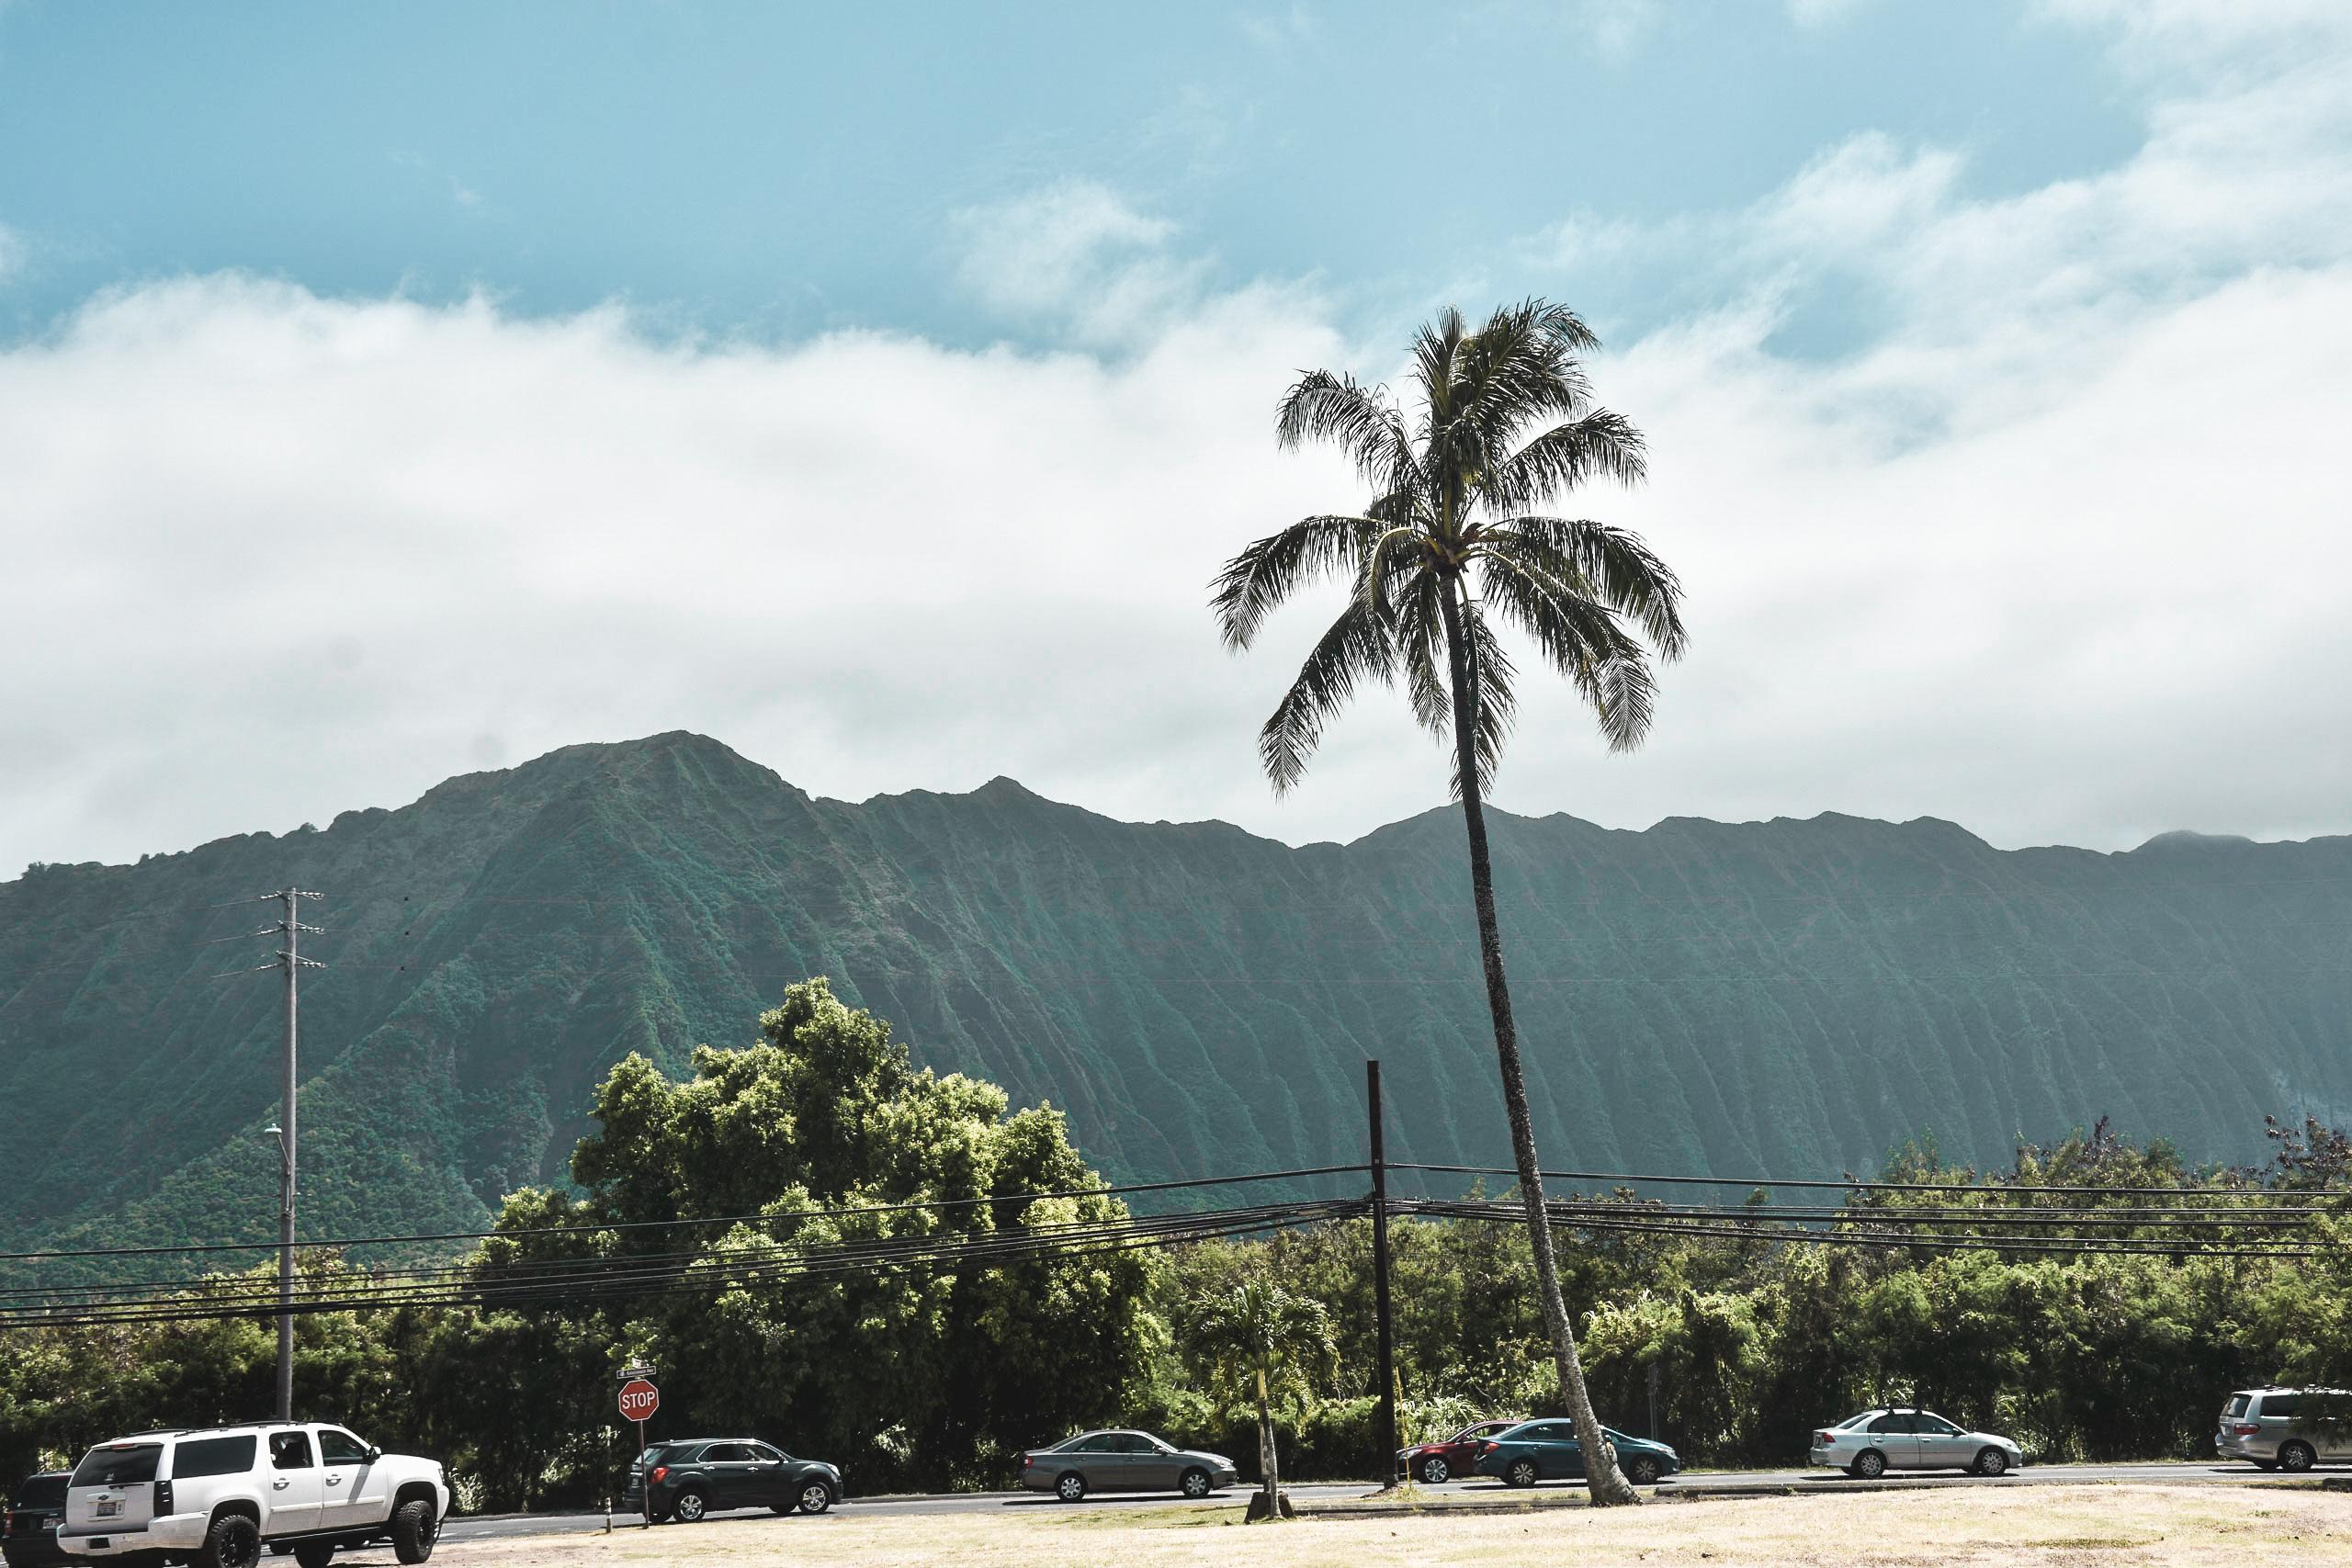 Vulcan Mountains in O'ahu